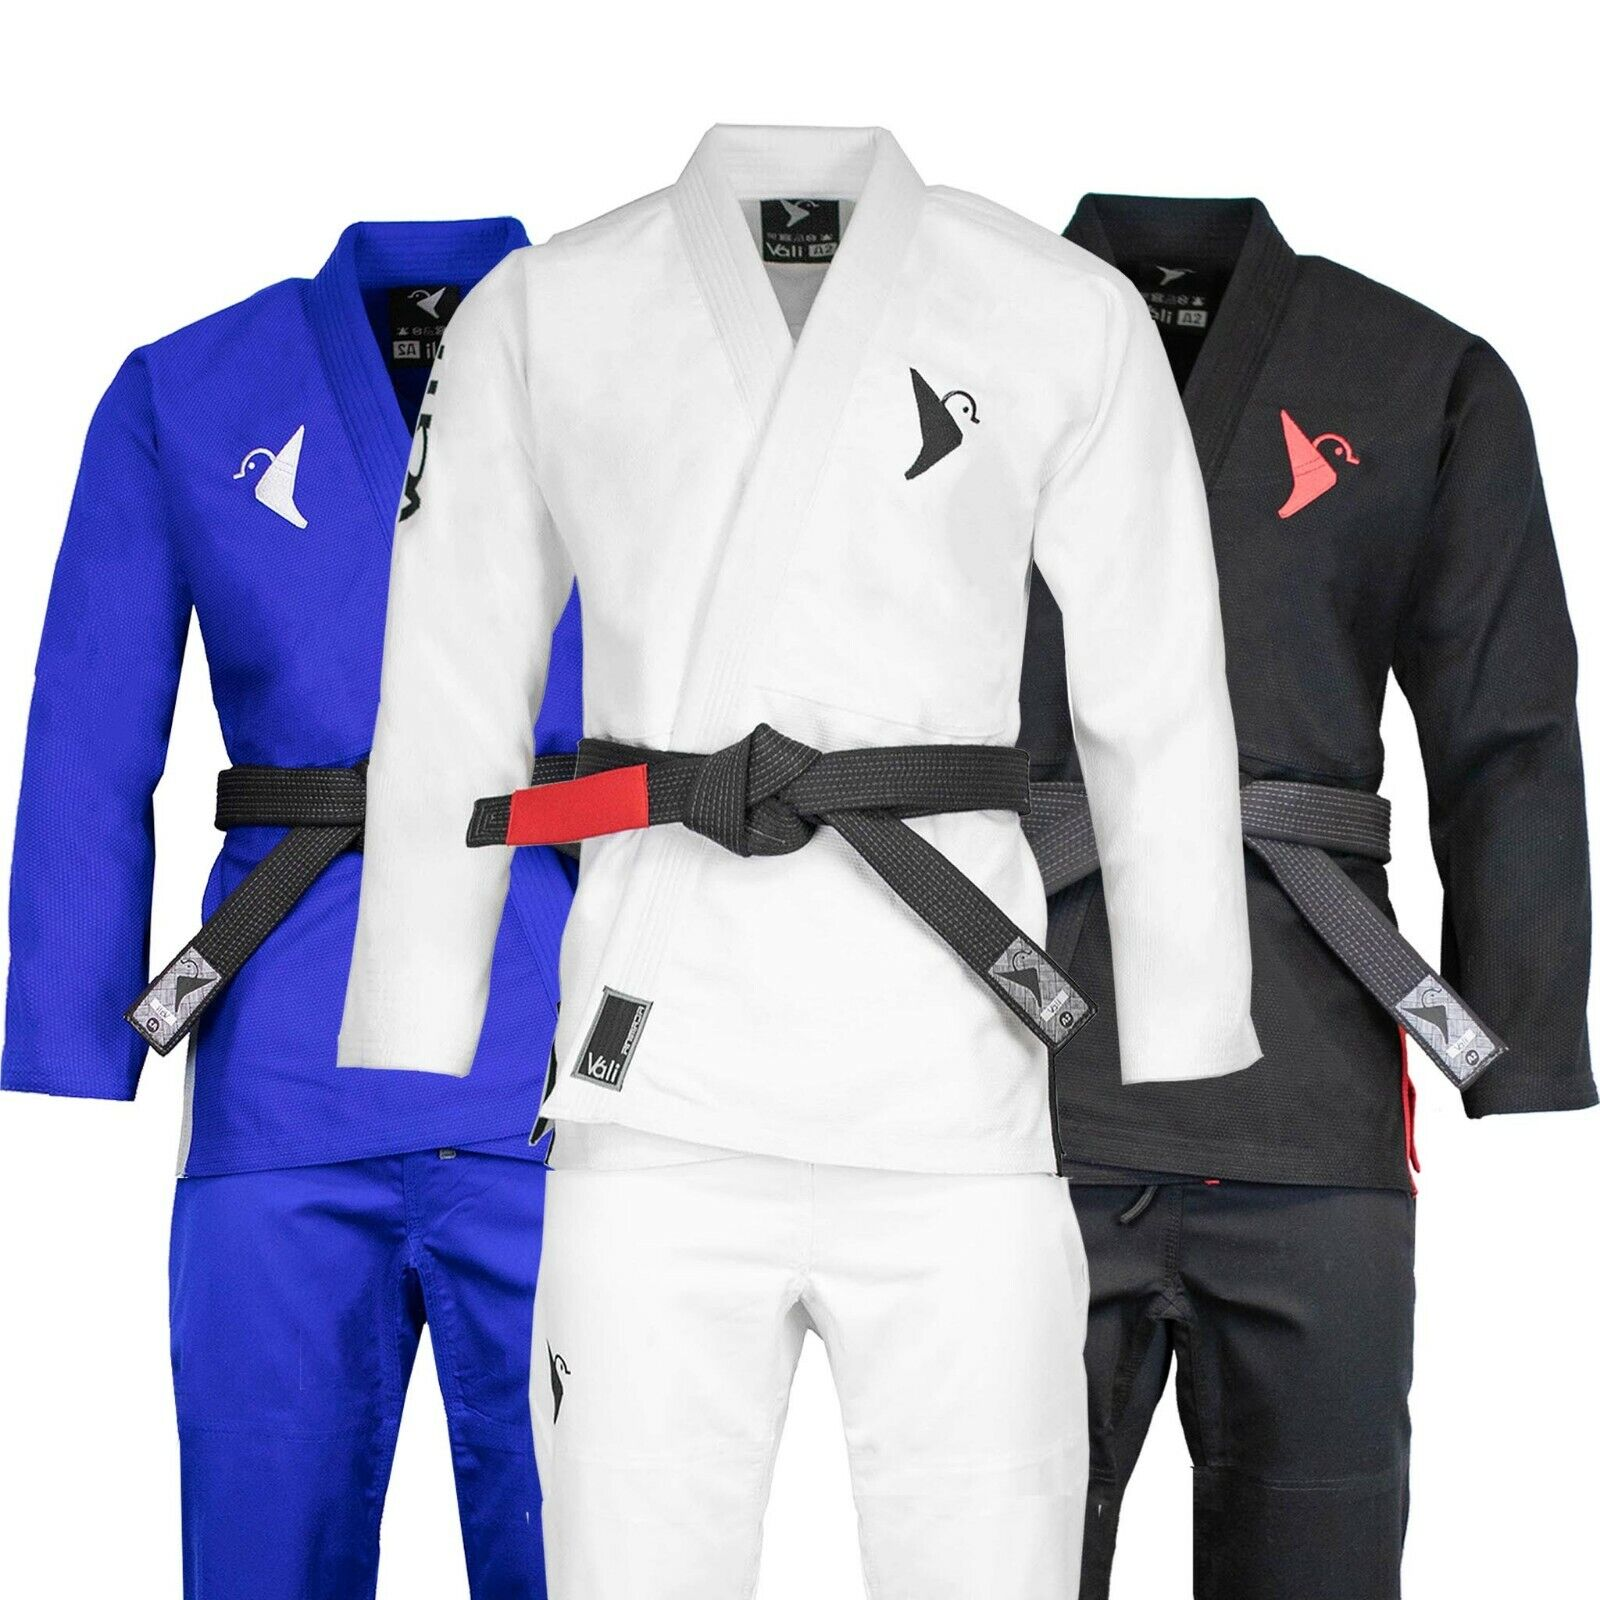 Vali BJJ Gi Brazilian Jiu  Jitsu Kimono Grappling MMA Uniform Pearl Weave  high quaity